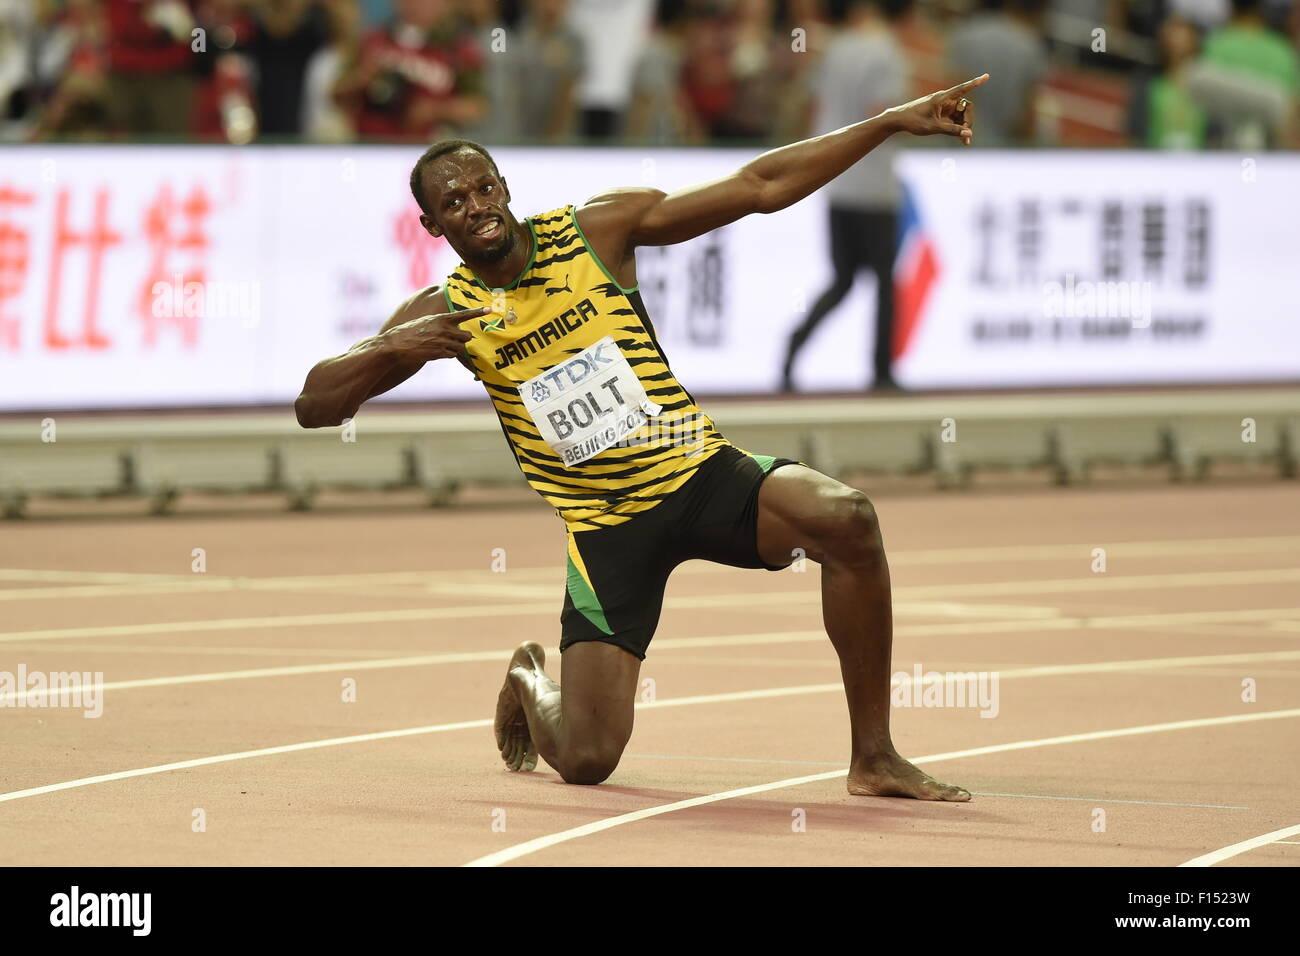 c51a2538333 Usain Bolt Beijing Stock Photos   Usain Bolt Beijing Stock Images ...